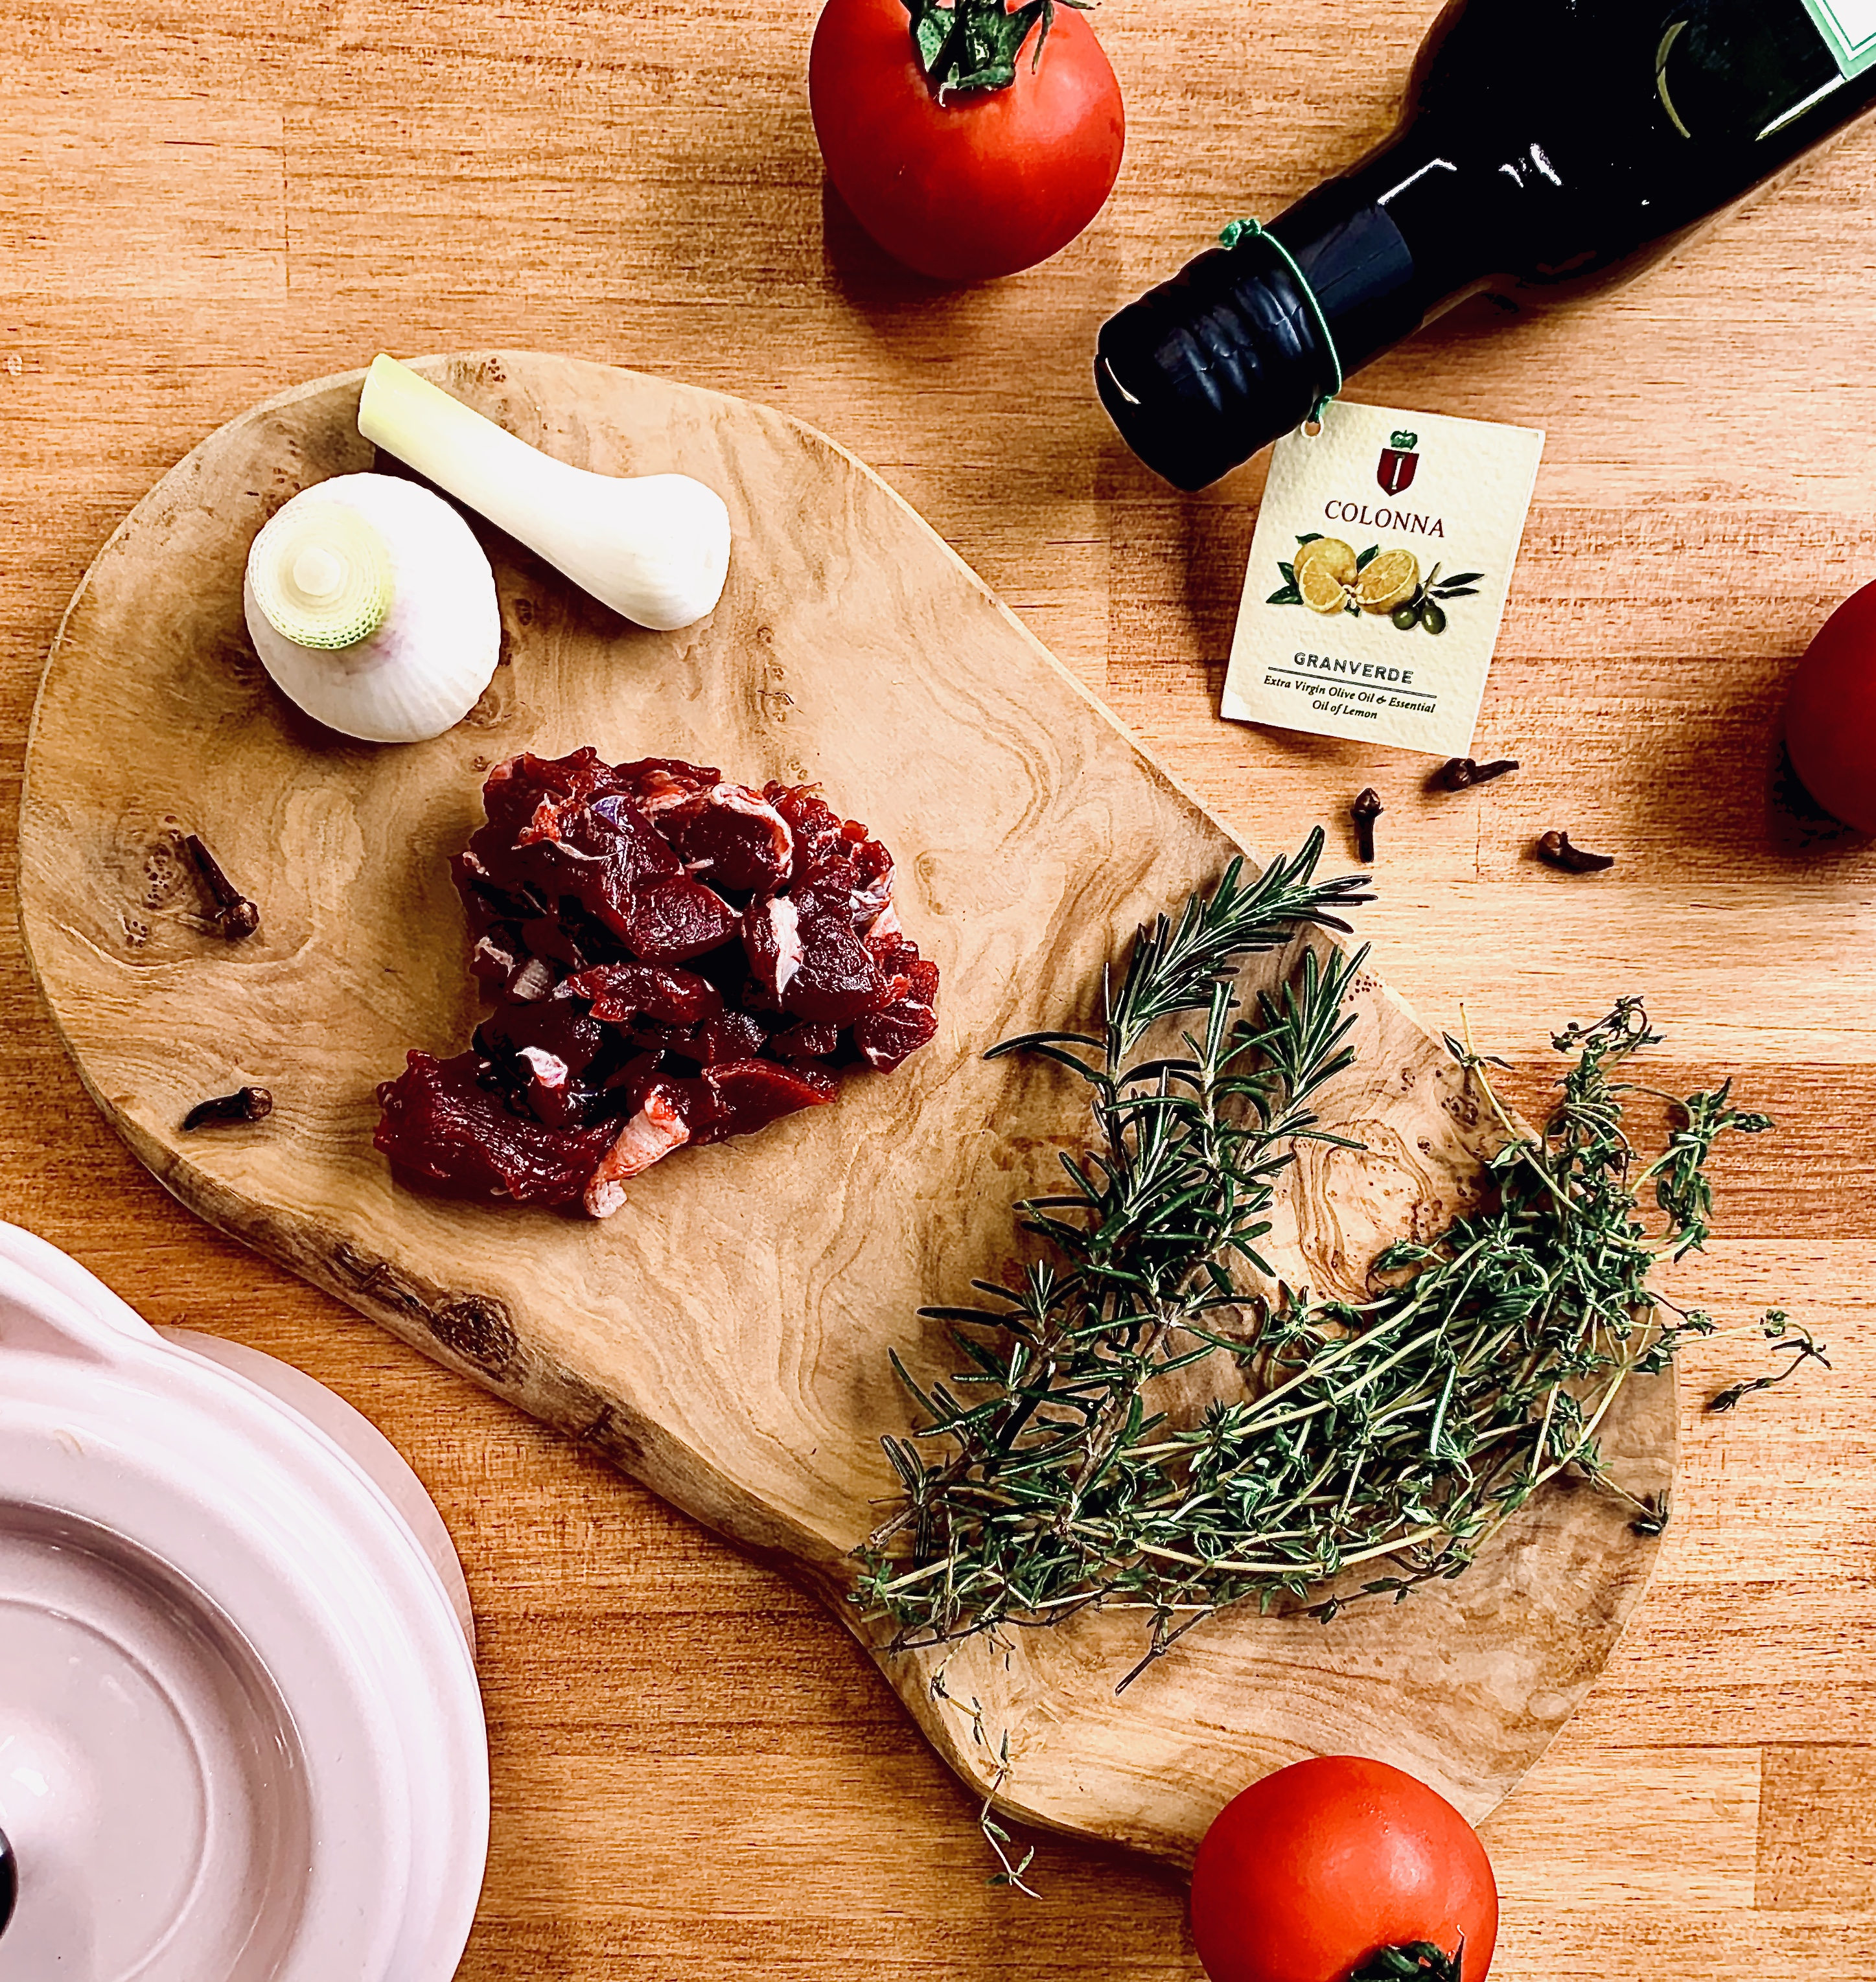 GASTRONOMIA 養老山脈「天然鹿」で作る、優しい味わいのラグーソース